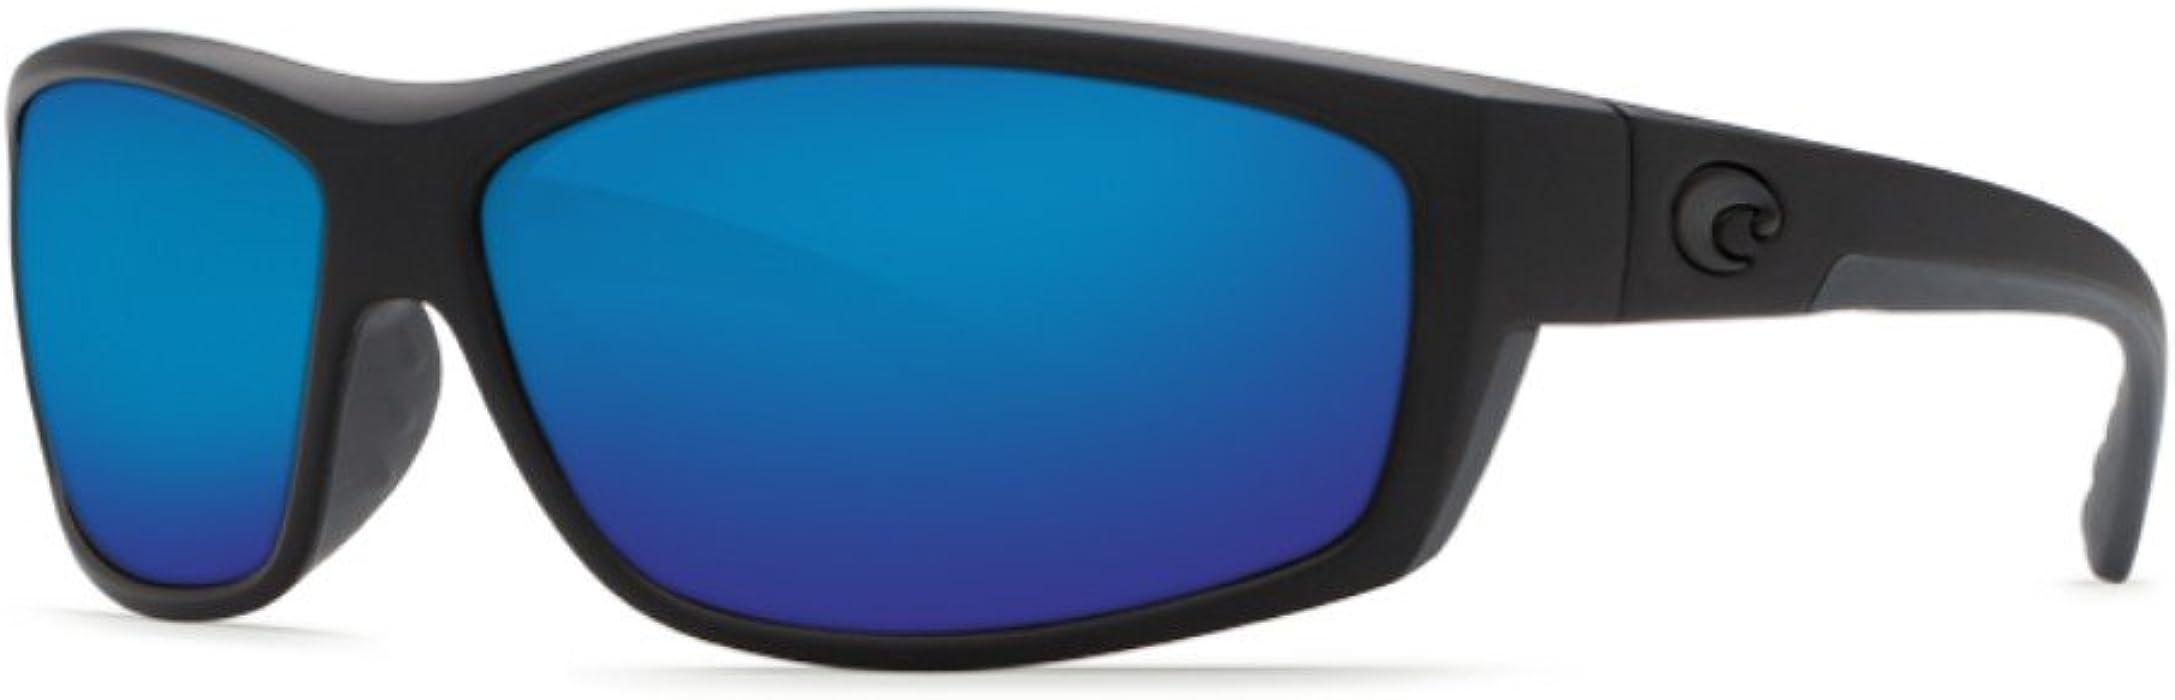 de25c6a02e Costa Del Mar Saltbreak 580G Polarized Sunglasses in Blackout   Blue Mirror  Lens